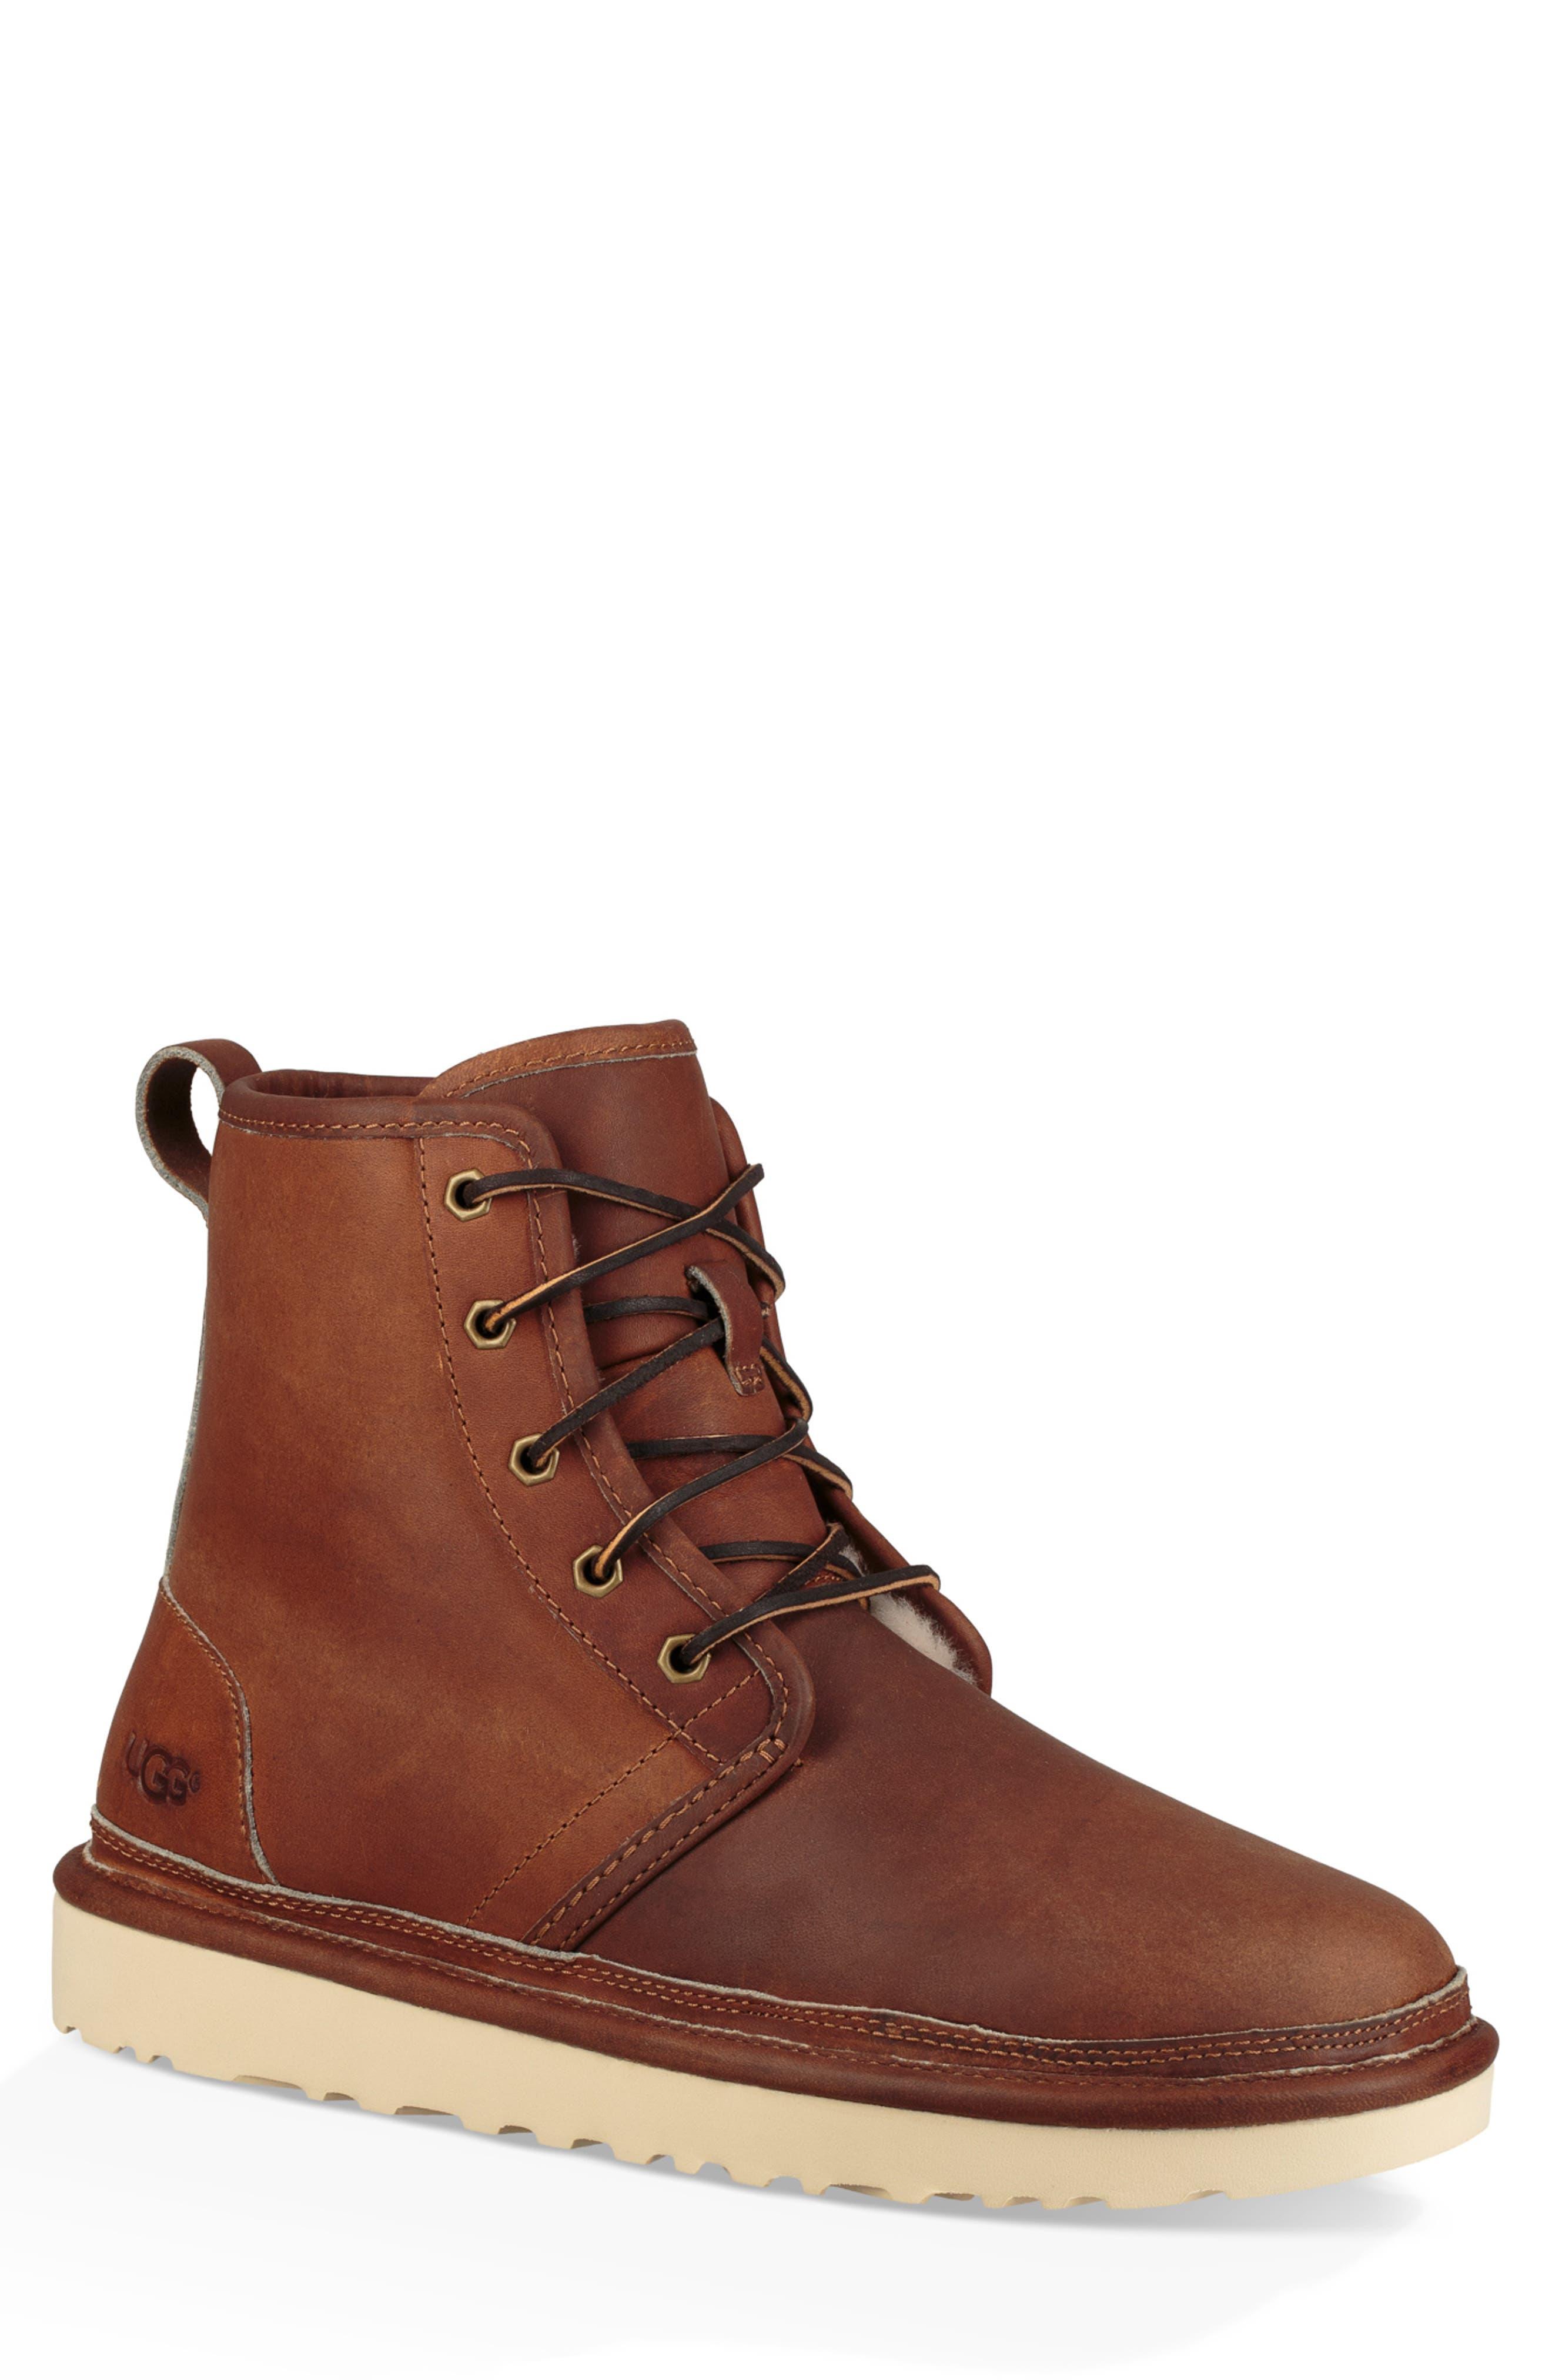 Harkley Pinnacle Boot,                         Main,                         color, TAN